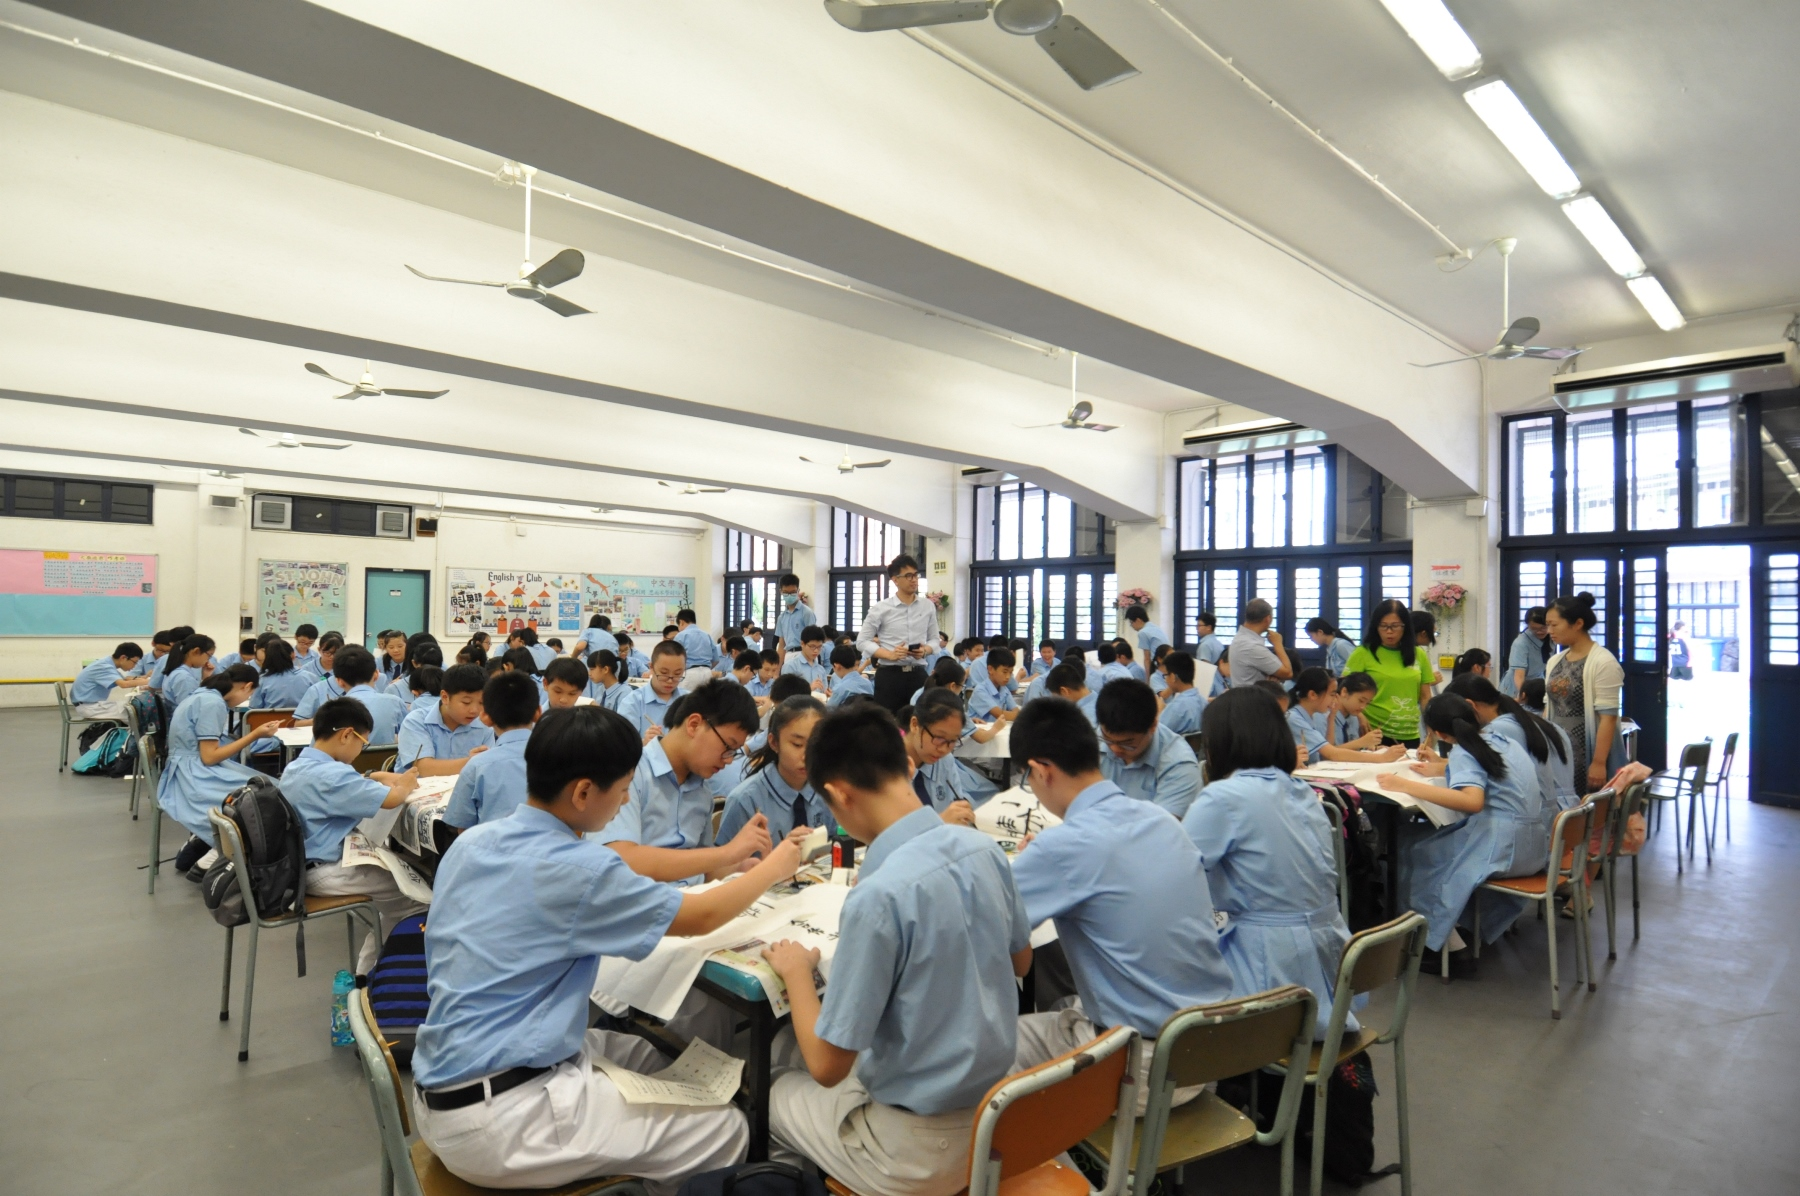 http://www.npc.edu.hk/sites/default/files/dsc_0212_2.jpg